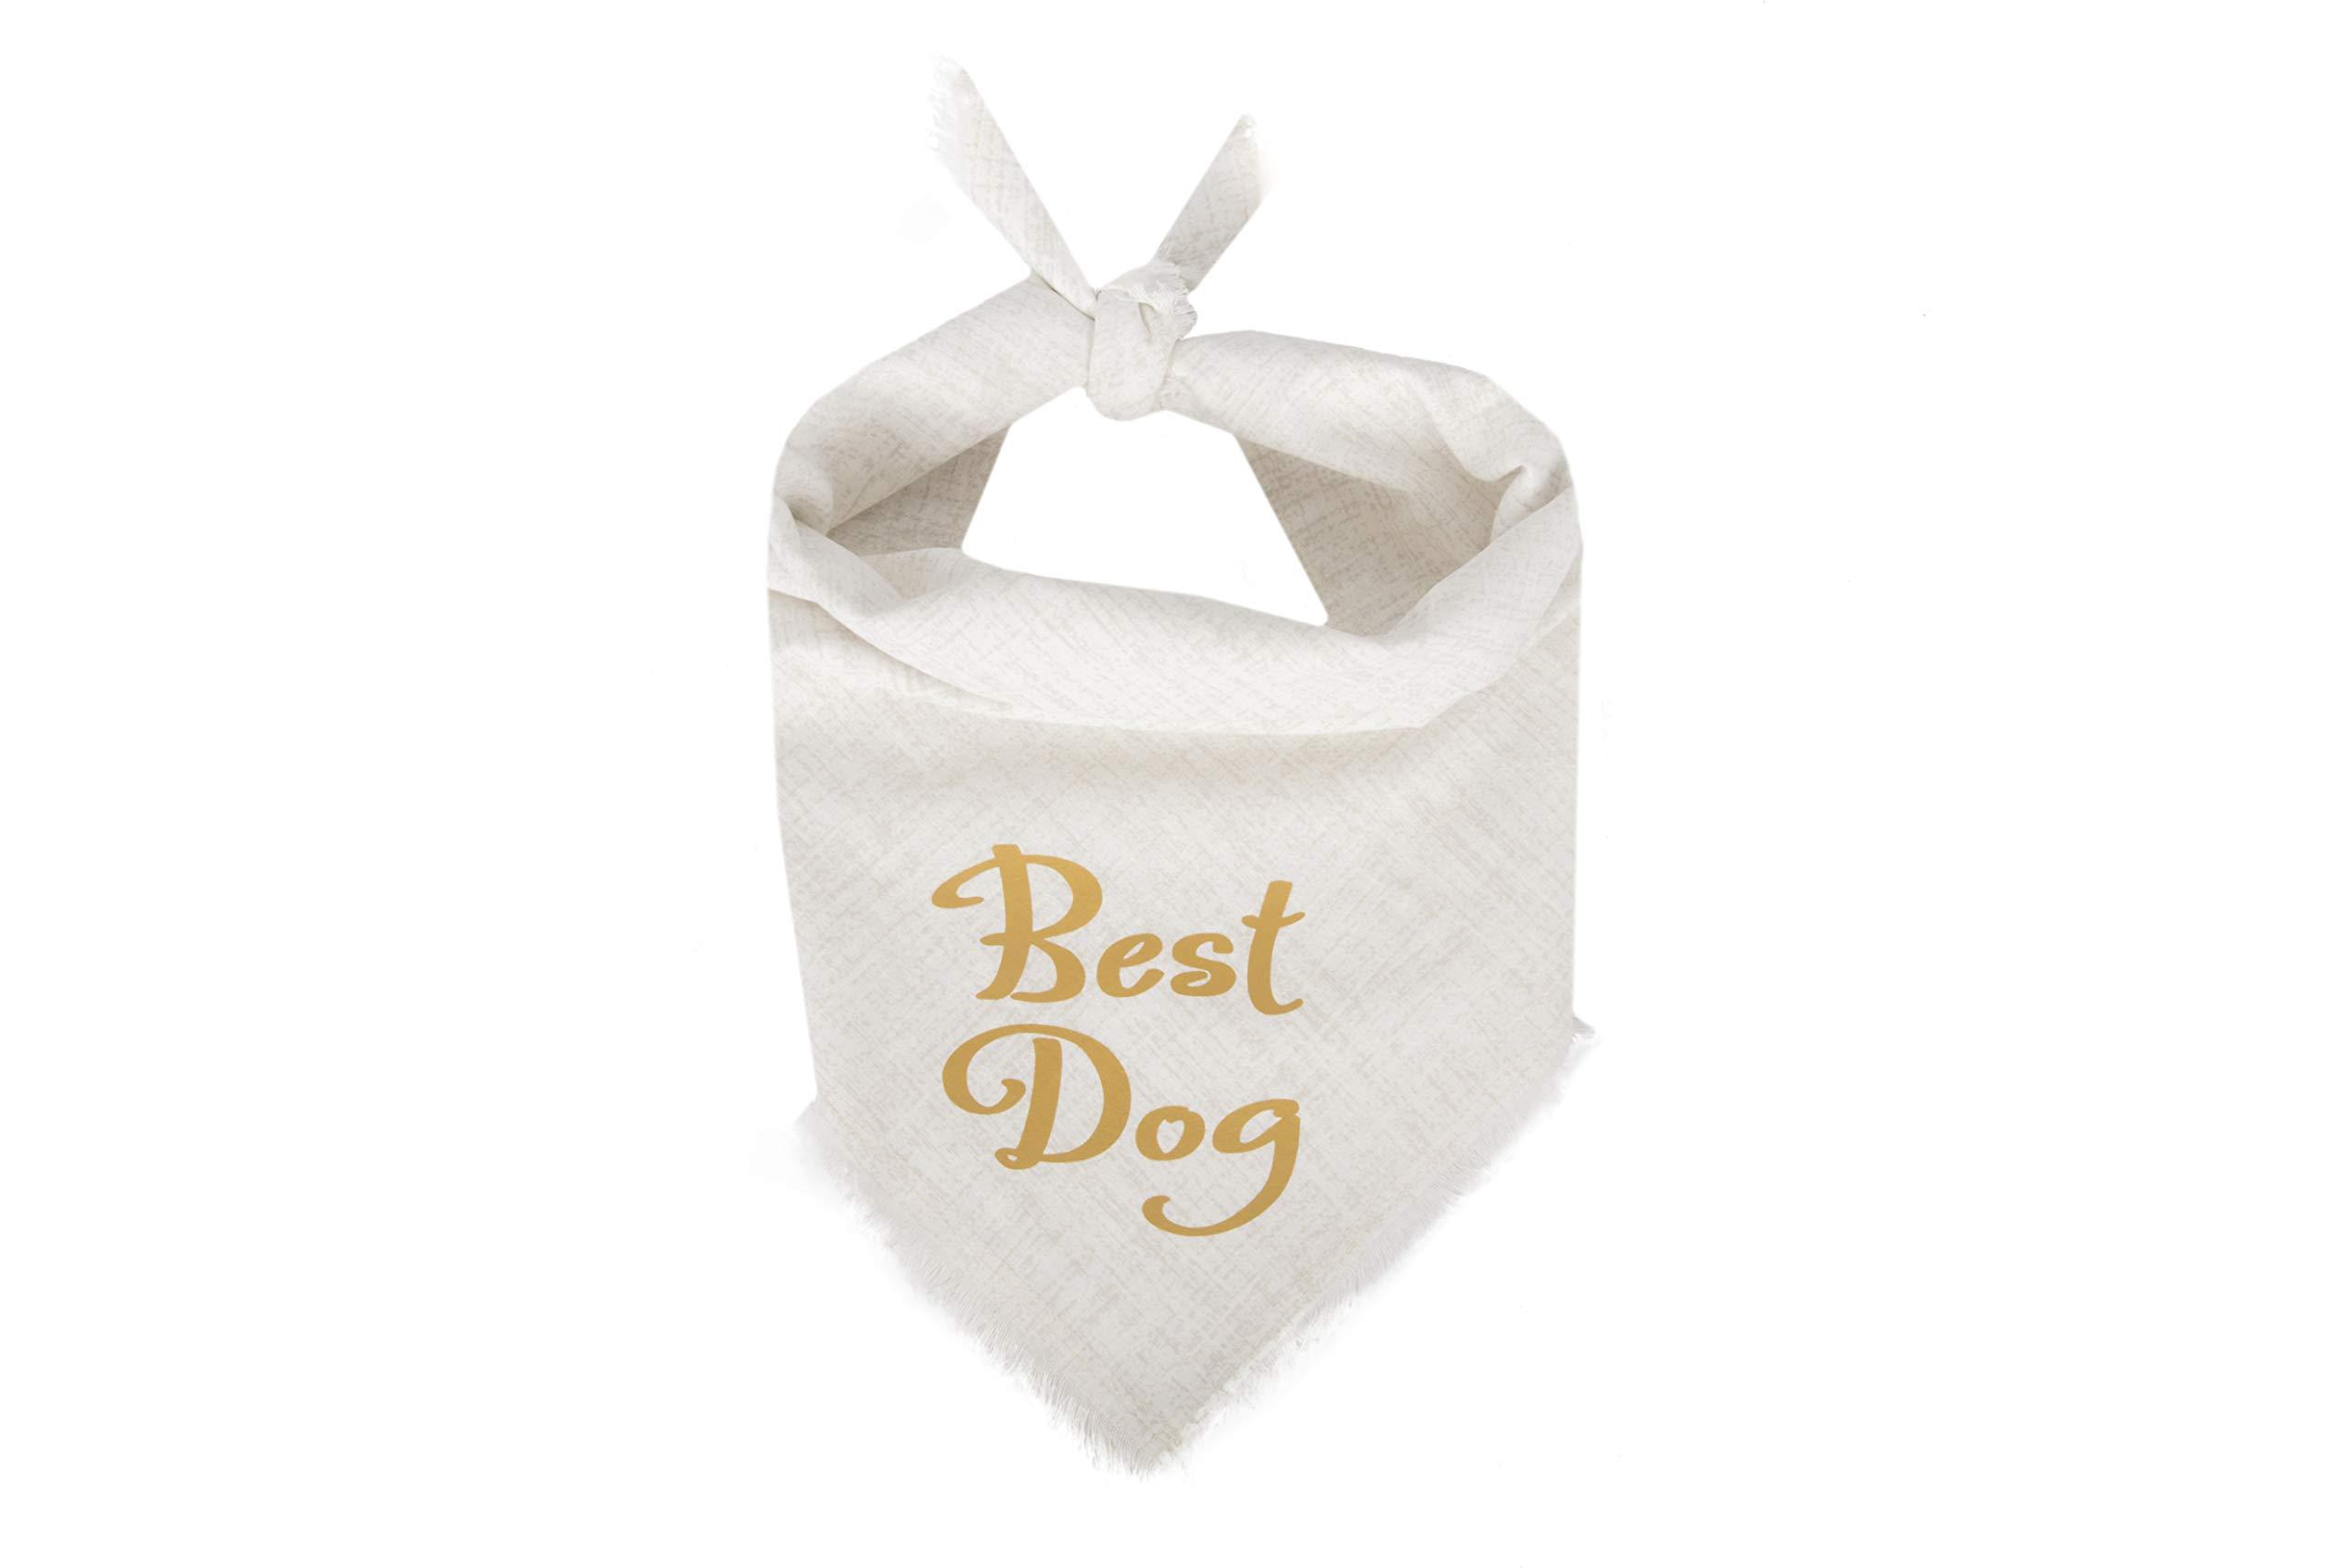 Willowear Dog Bandanas Best Dog Gold Large by Willowear